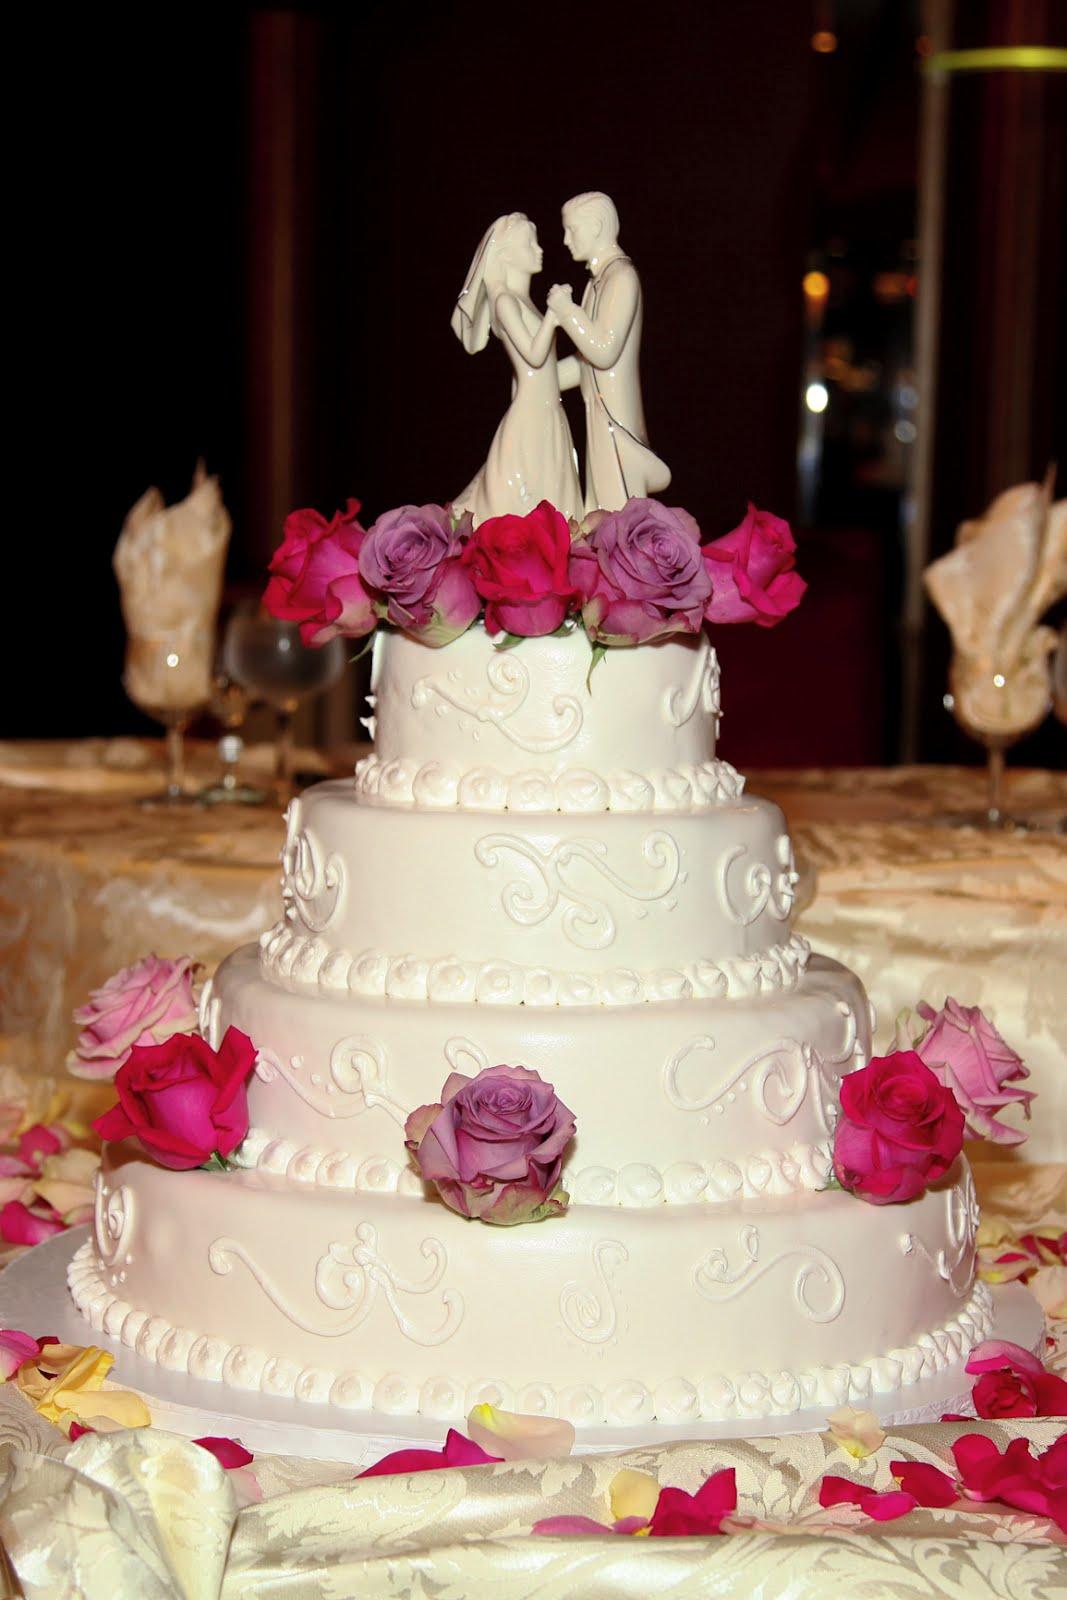 Best wedding cakes long island - Wedding Cake Bakery Long Island Amazing Wedding Pictures Viewing Gallery